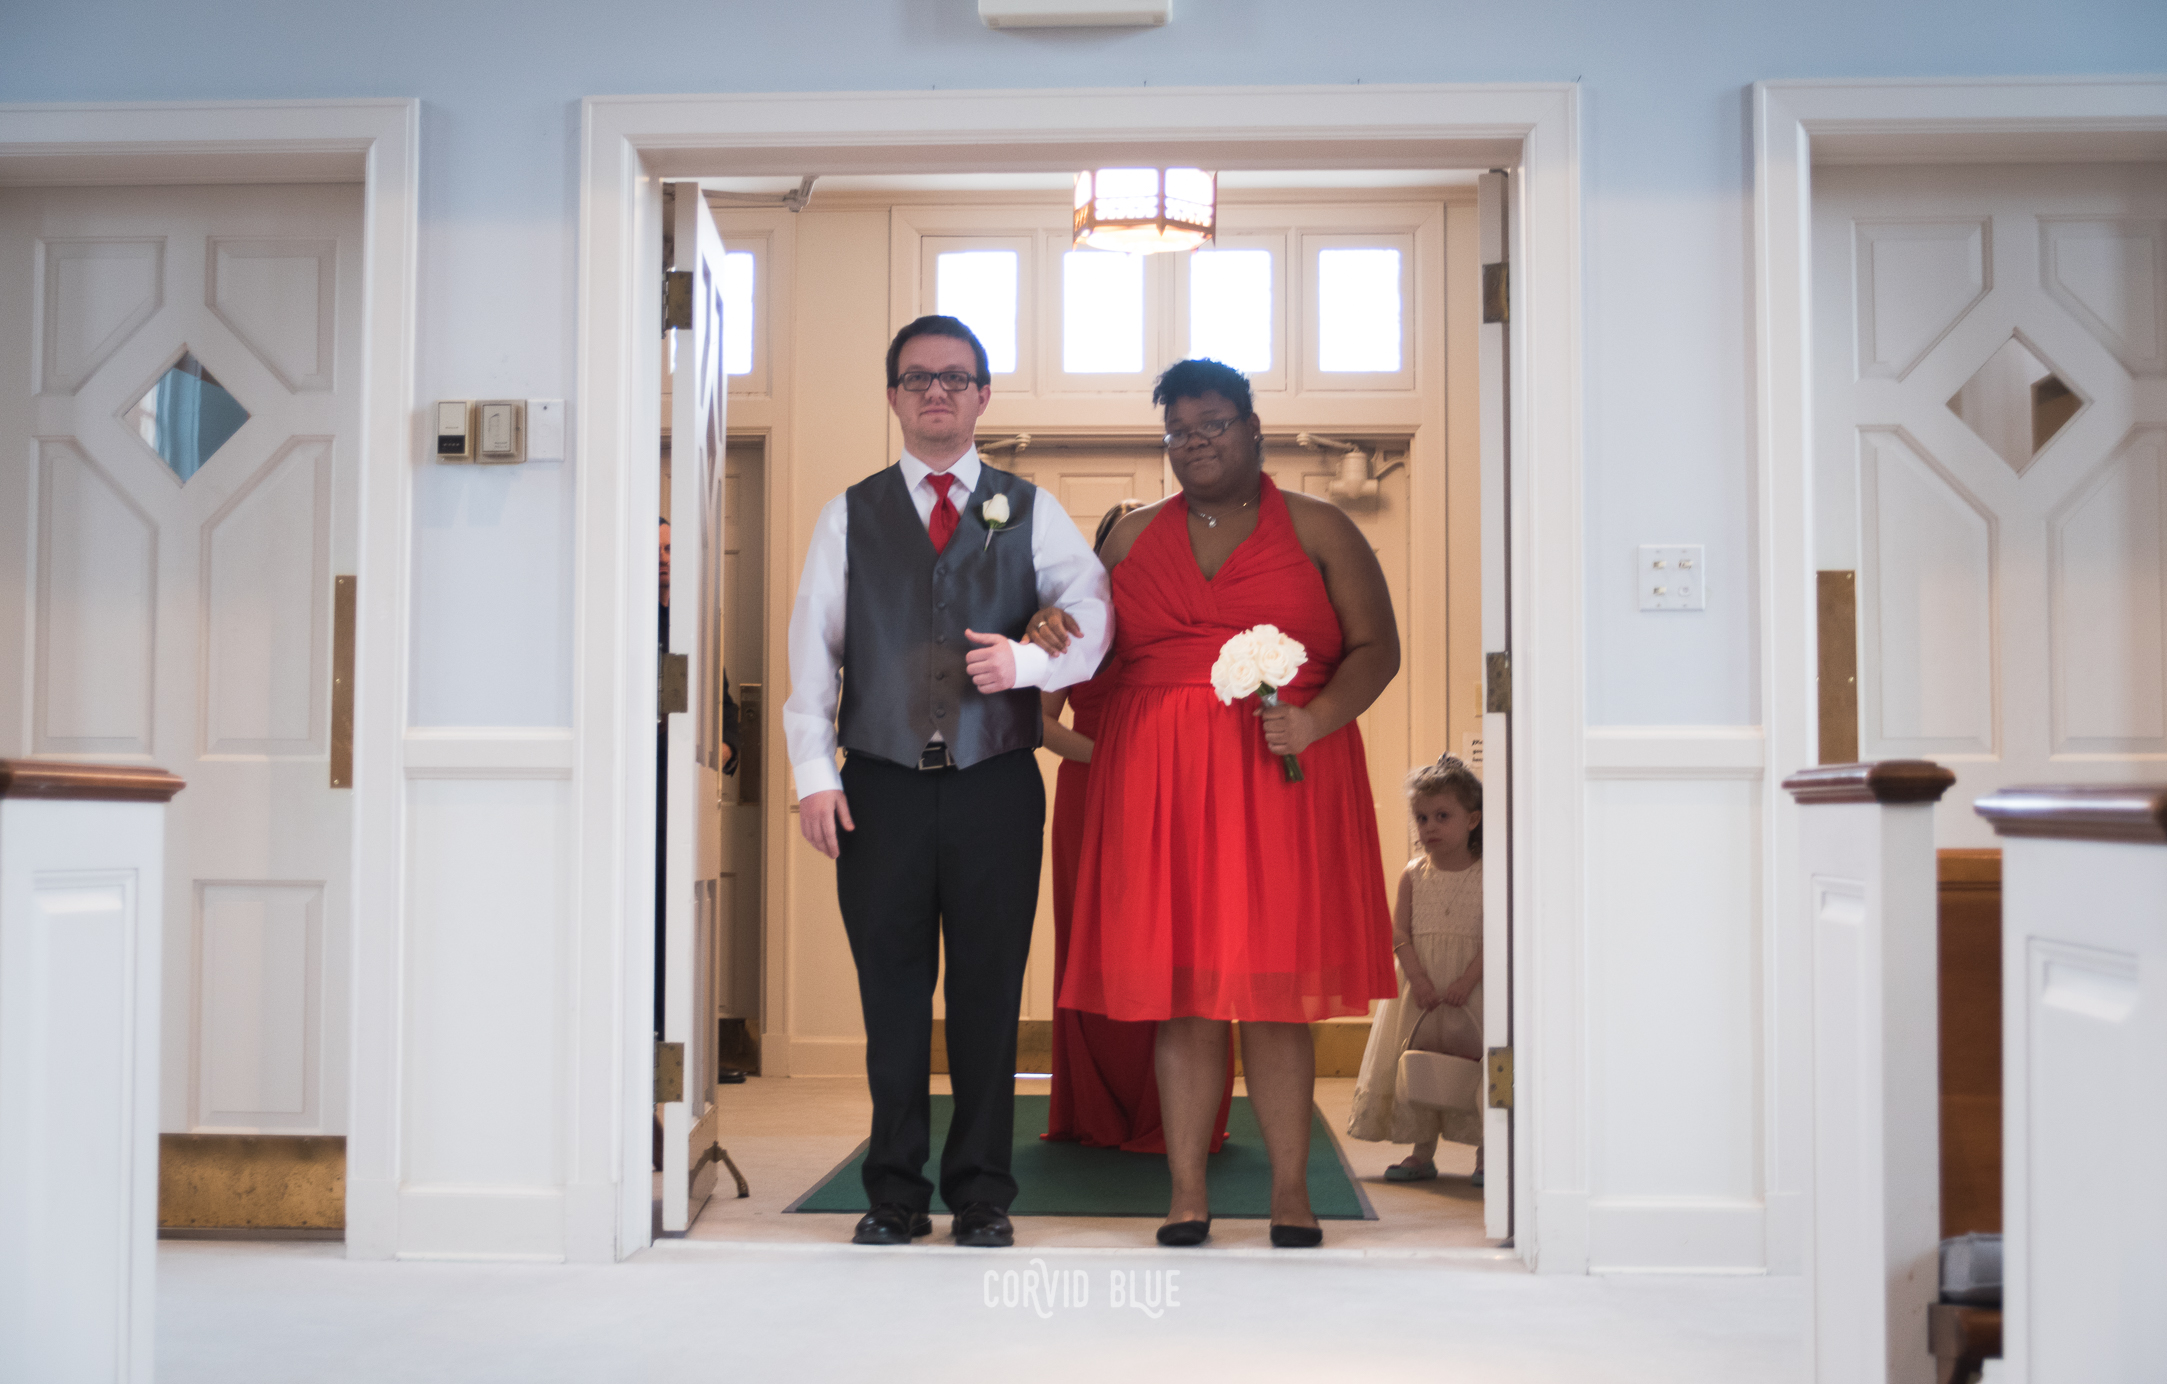 Kirk wedding-178.jpg